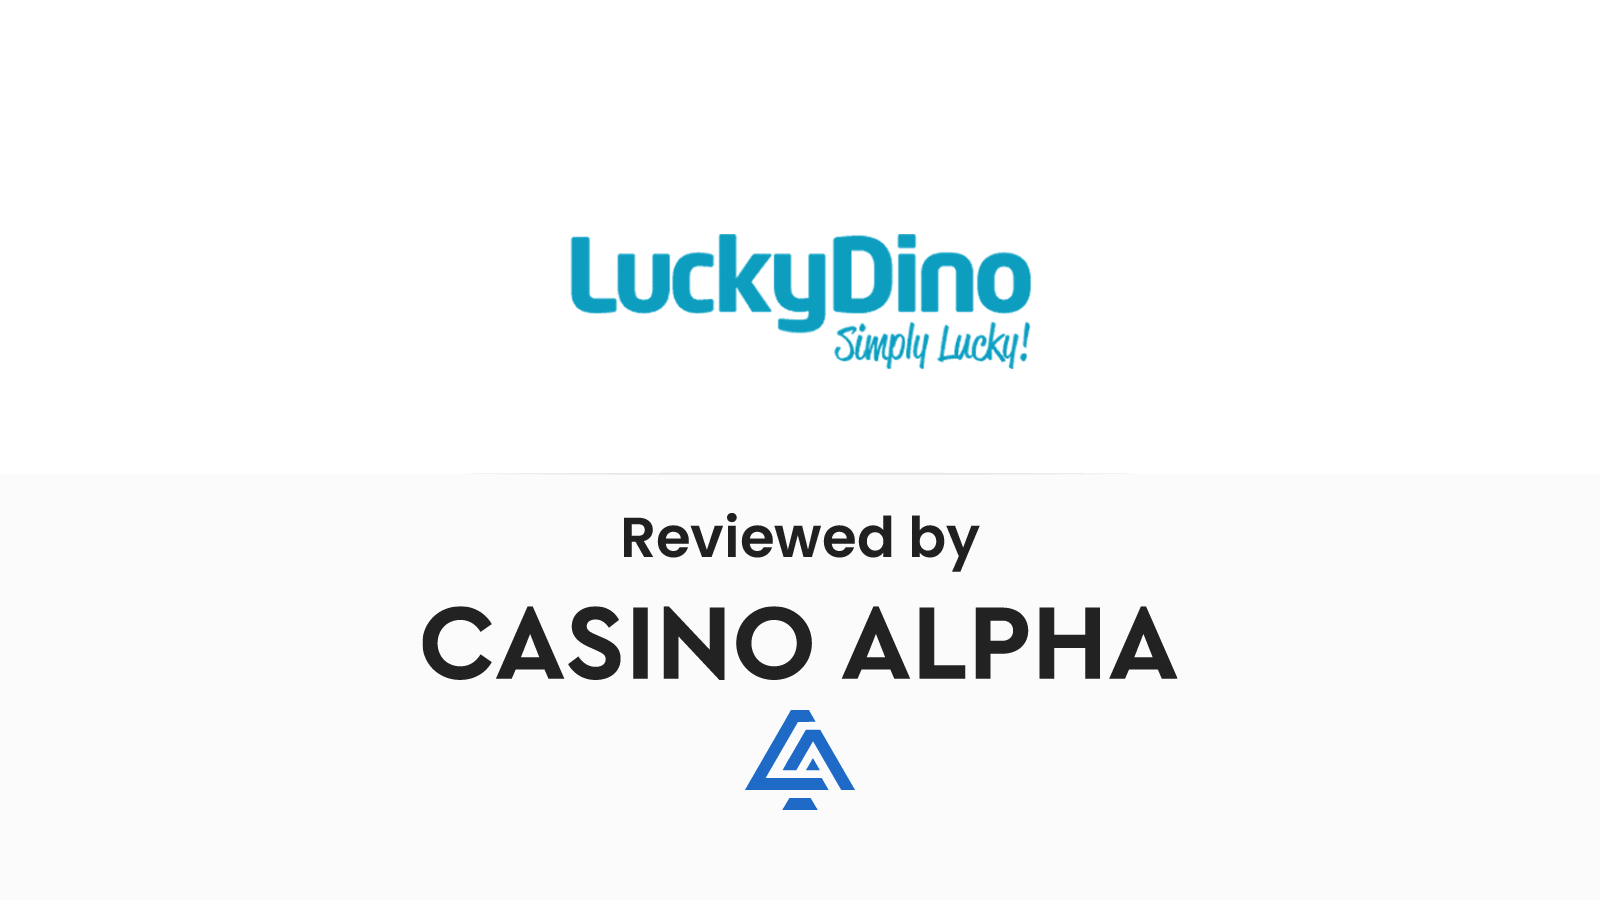 LuckyDino Review & Bonuses